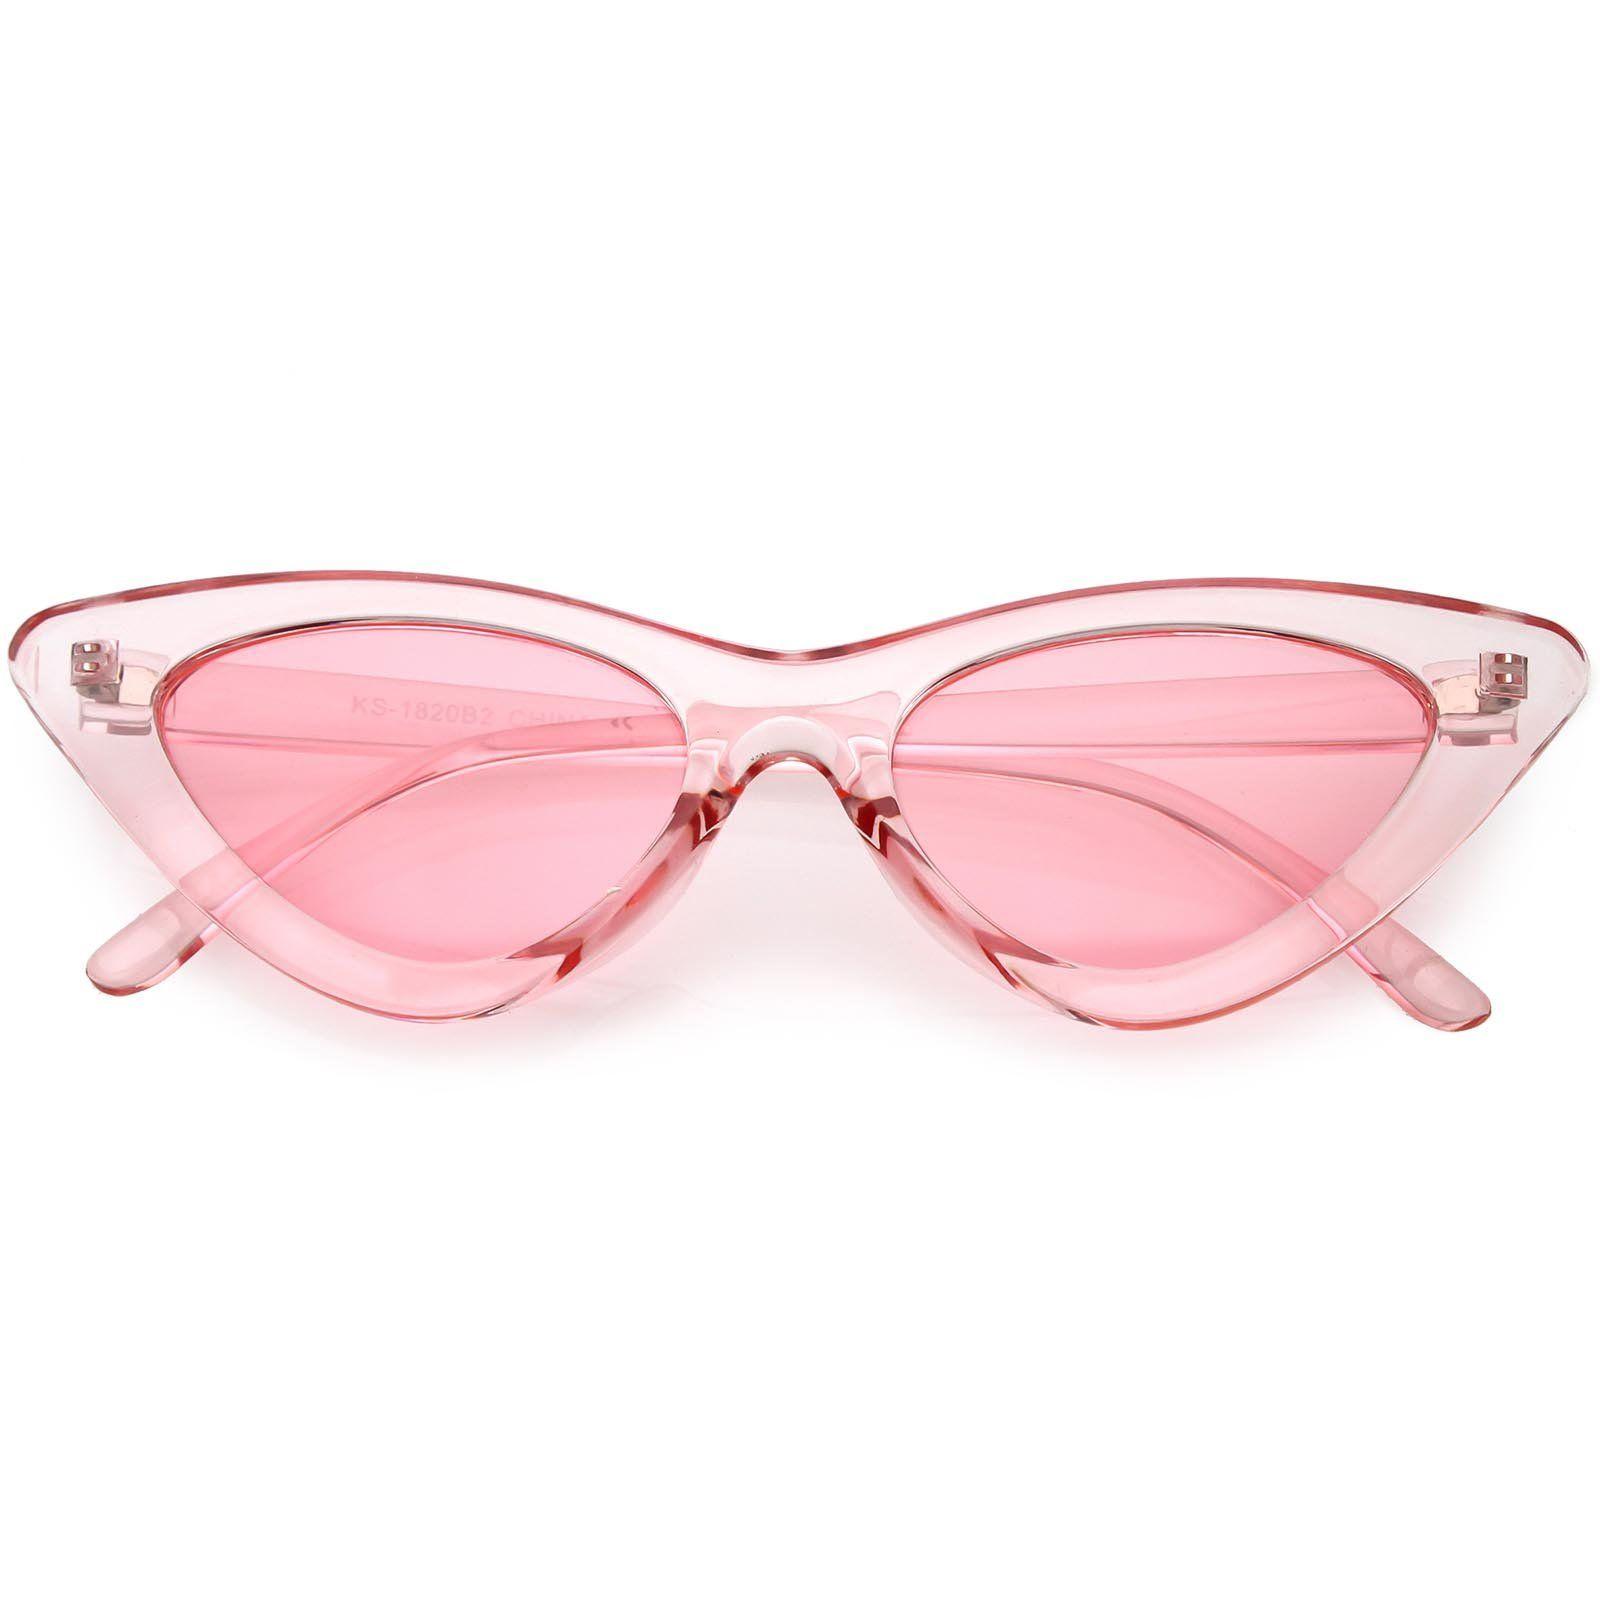 Womens Exaggerated Translucent Cat Eye Sunglasses Color Tinted Lens 48mm Cat Eye Sunglasses Colored Sunglasses Pink Sunglasses